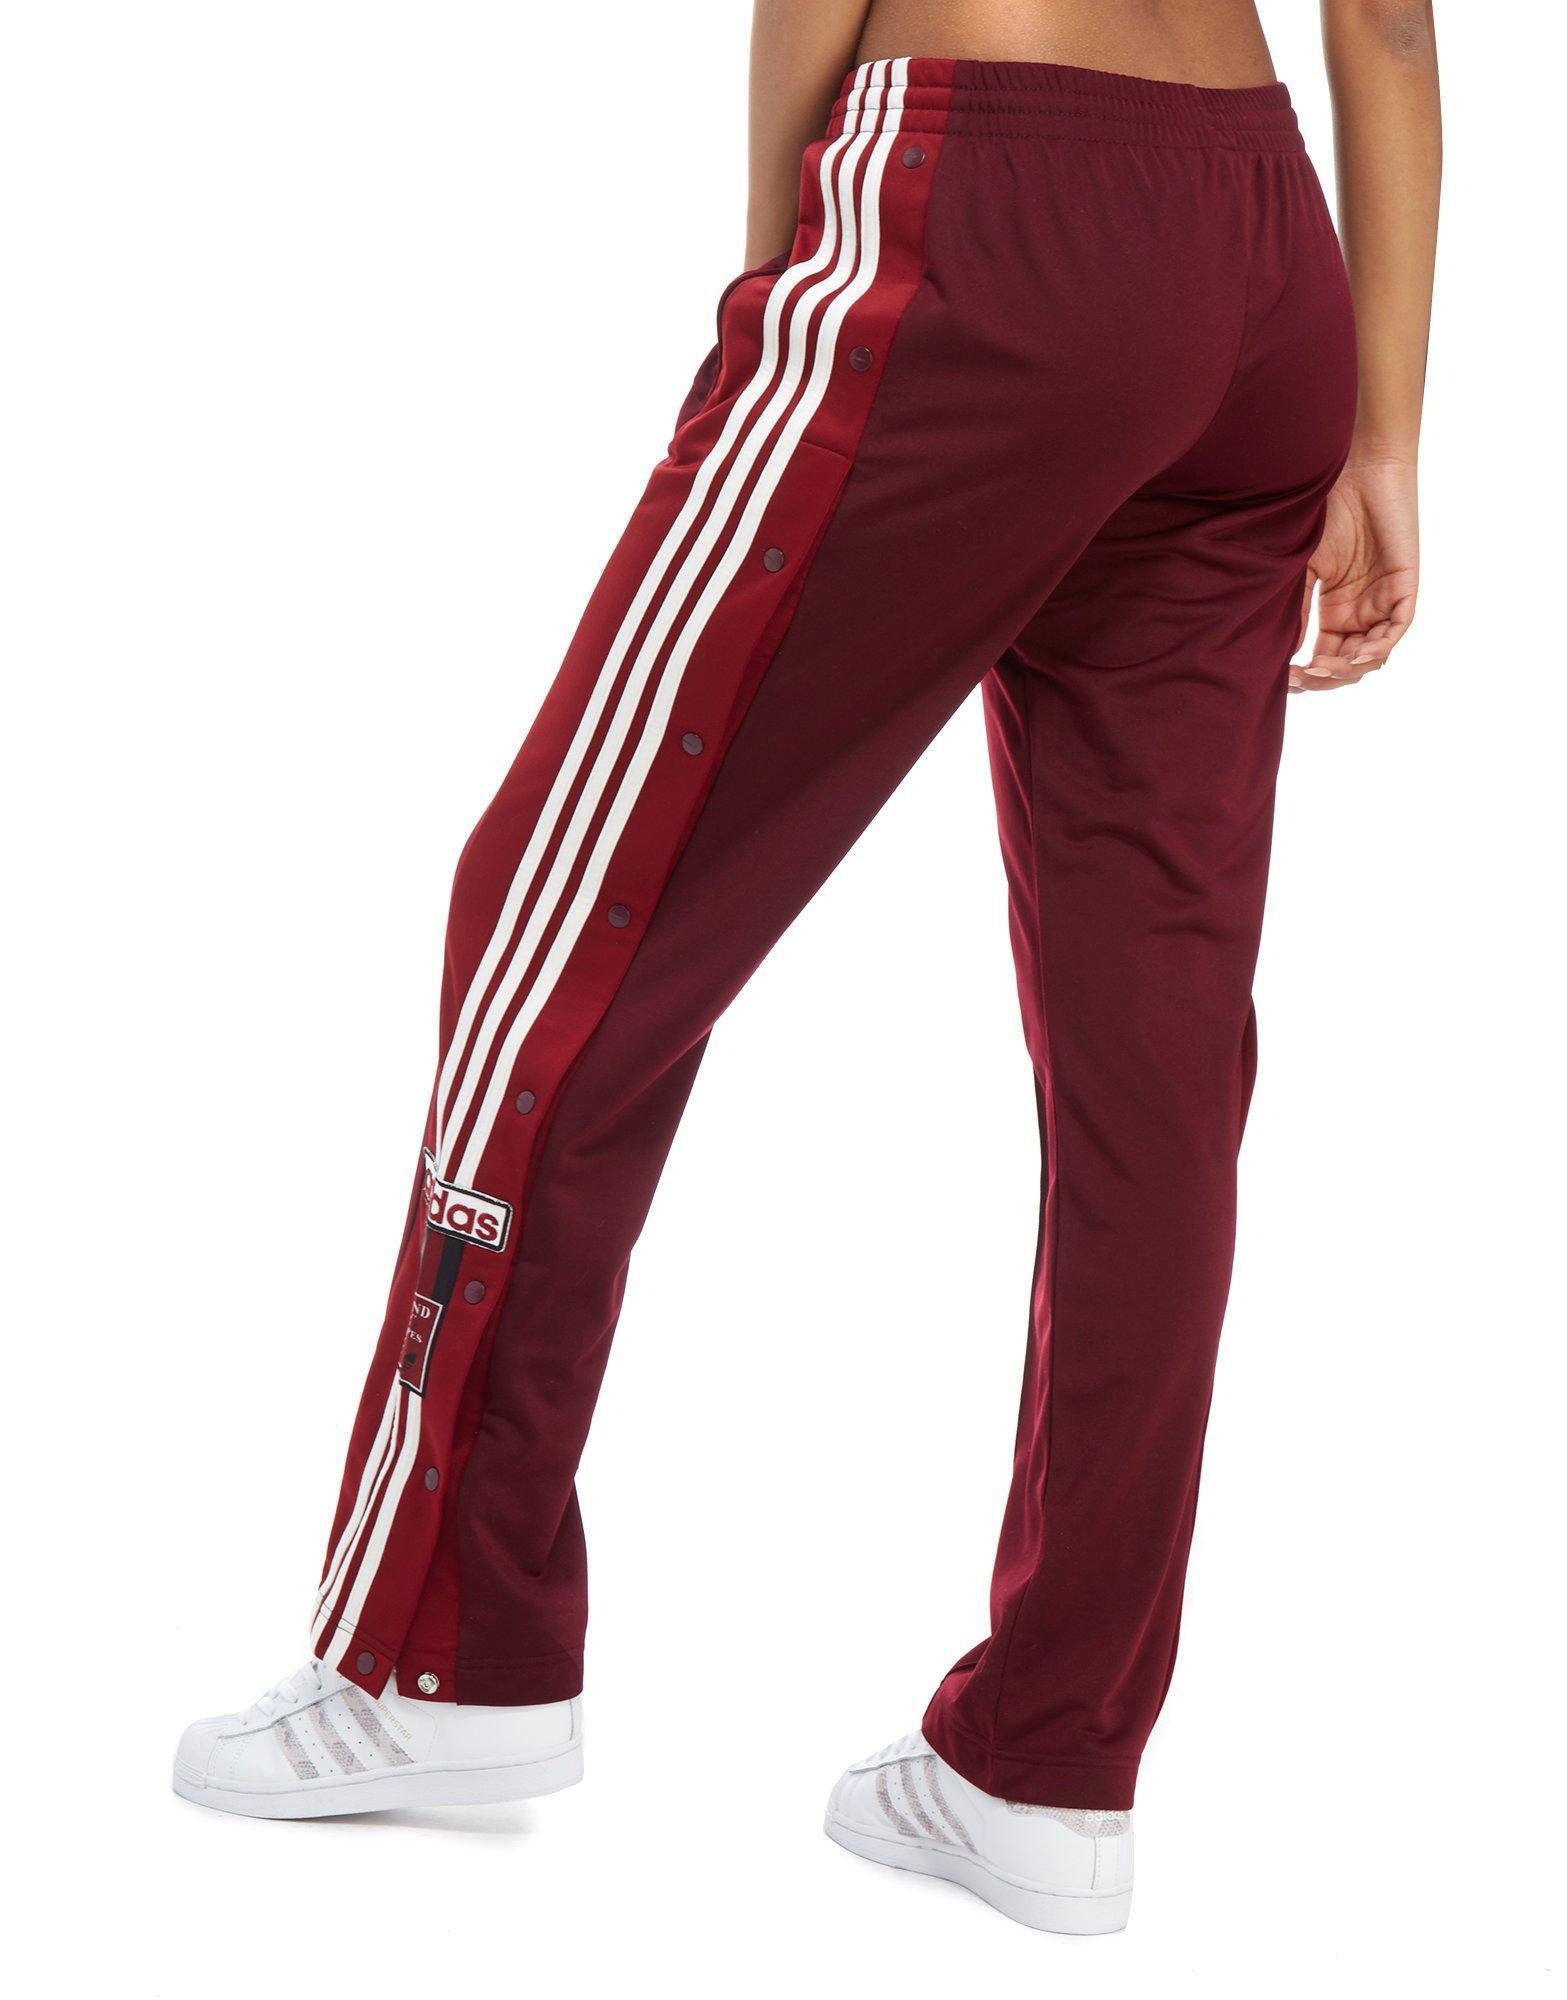 adidas pants red